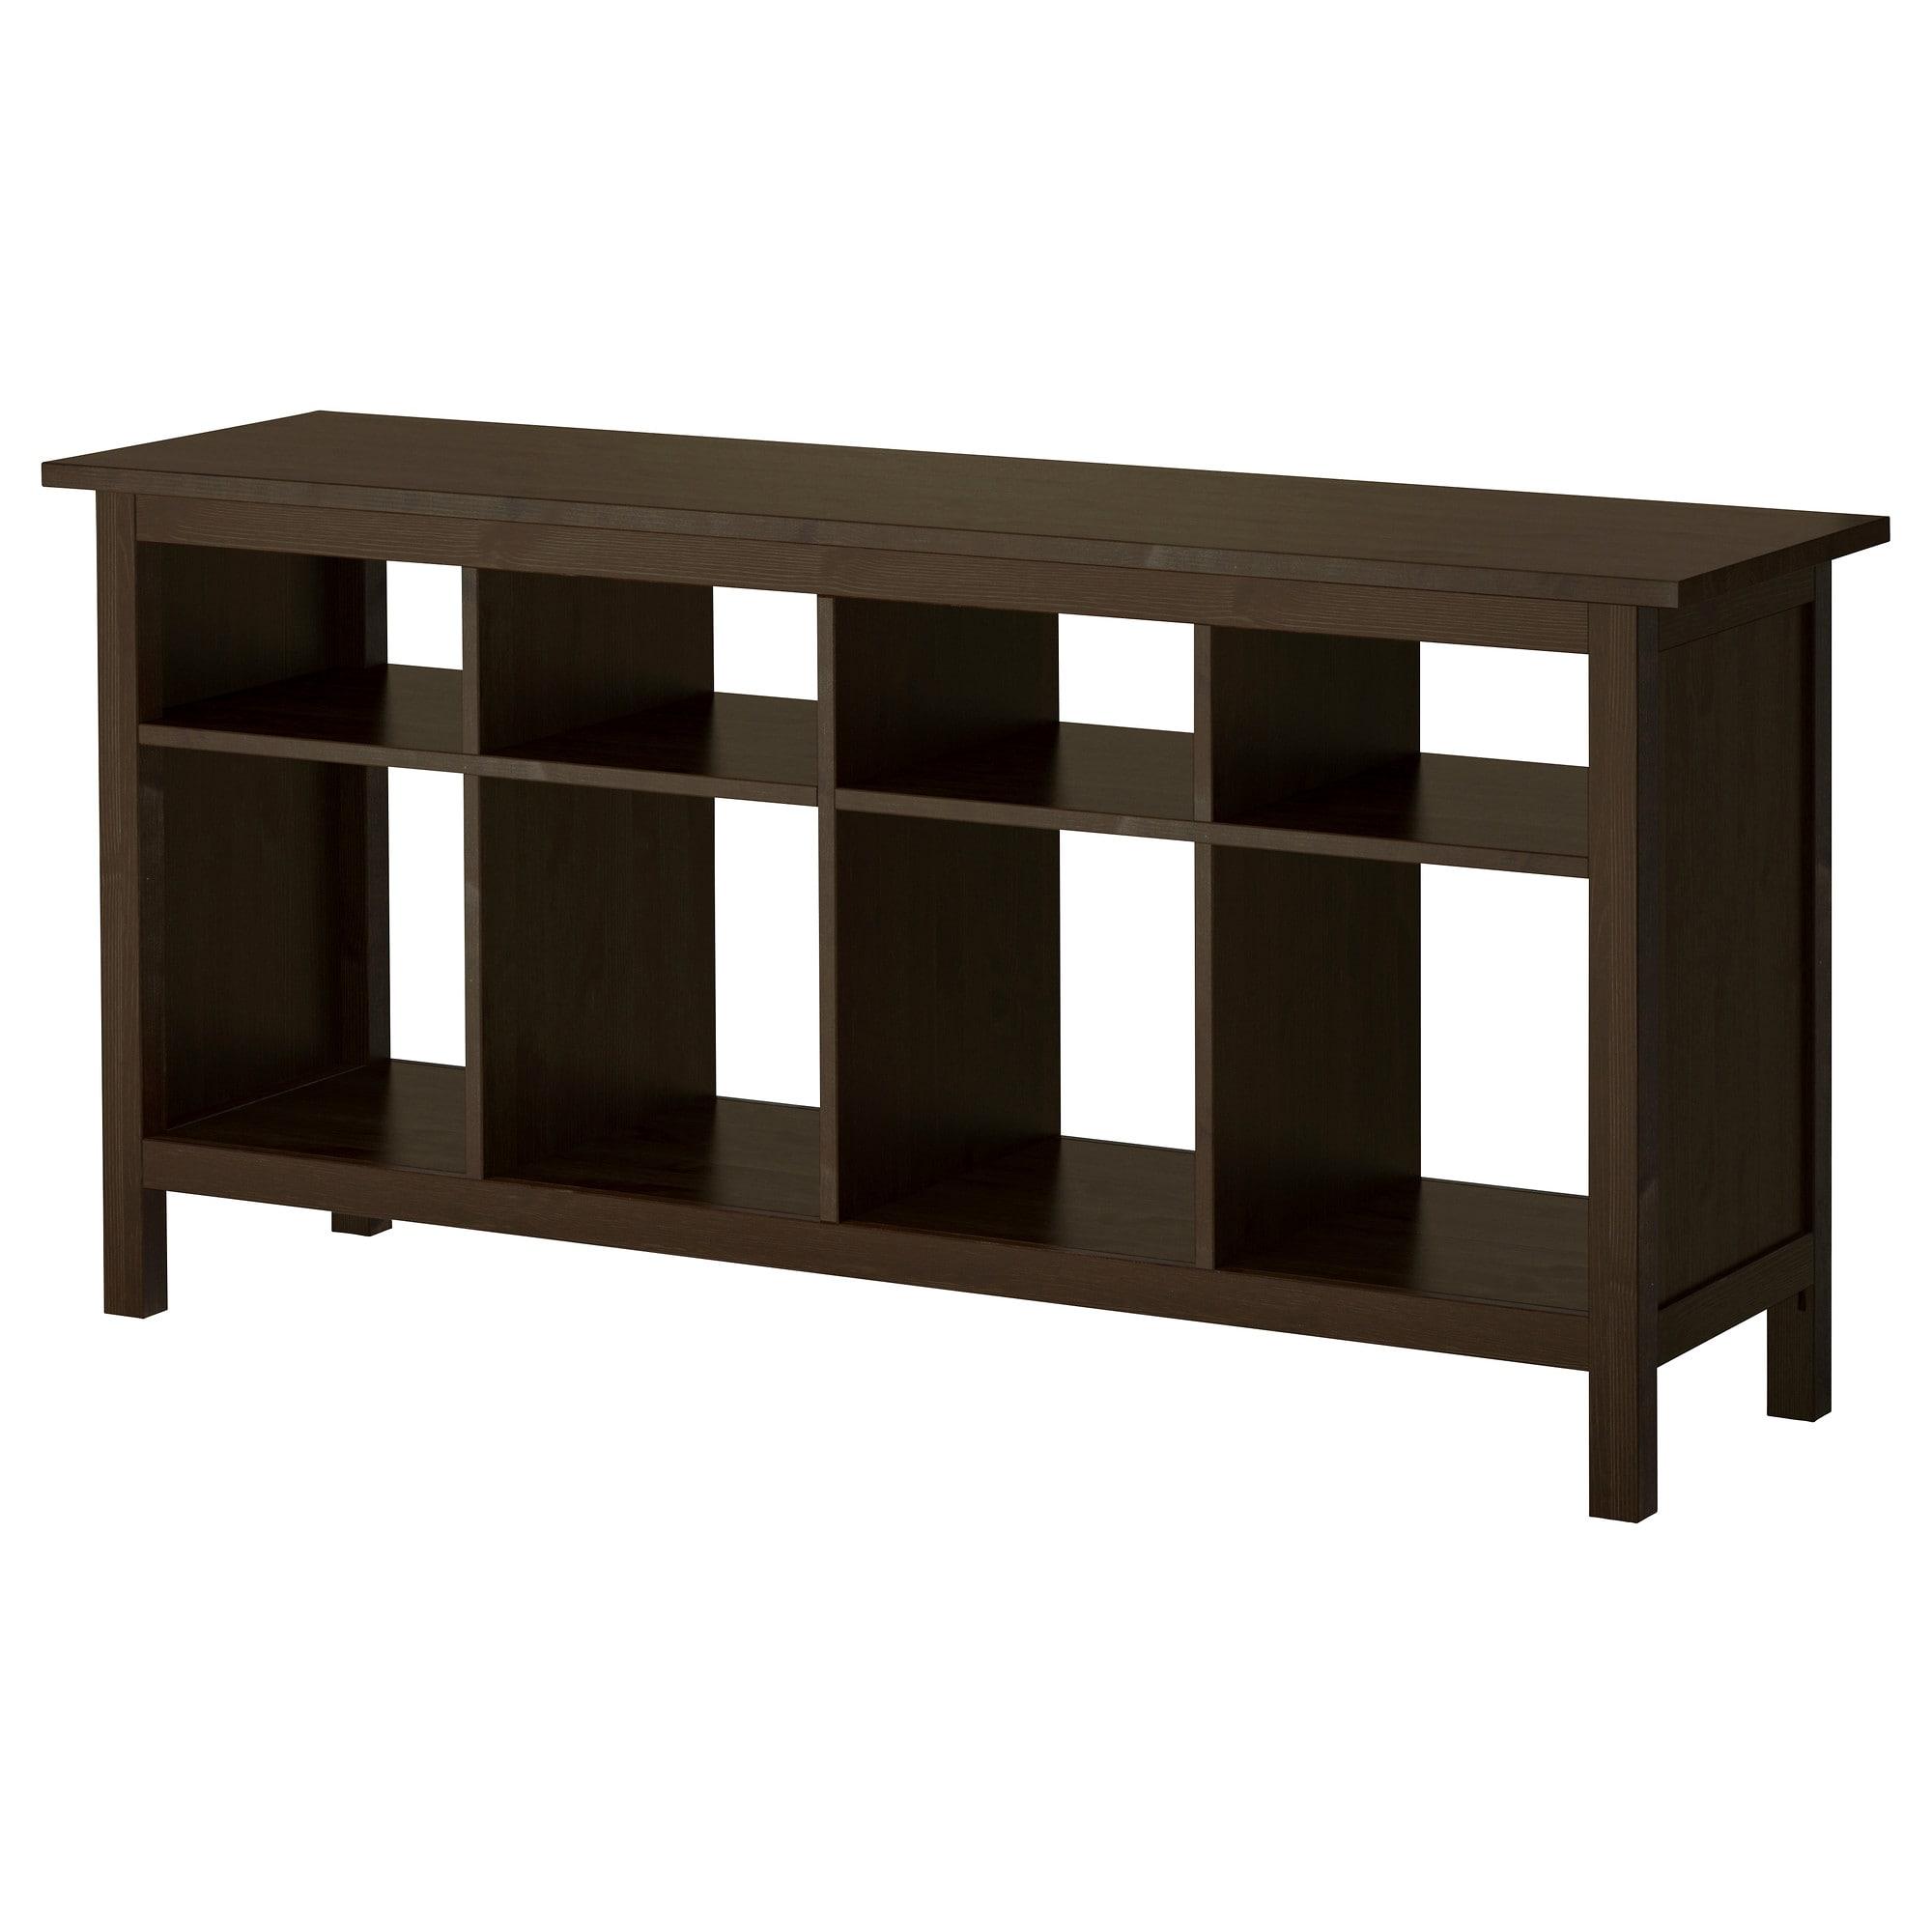 Ikea Us Furniture And Home Furnishings Ikea Sofa Table Hemnes Ikea Hemnes